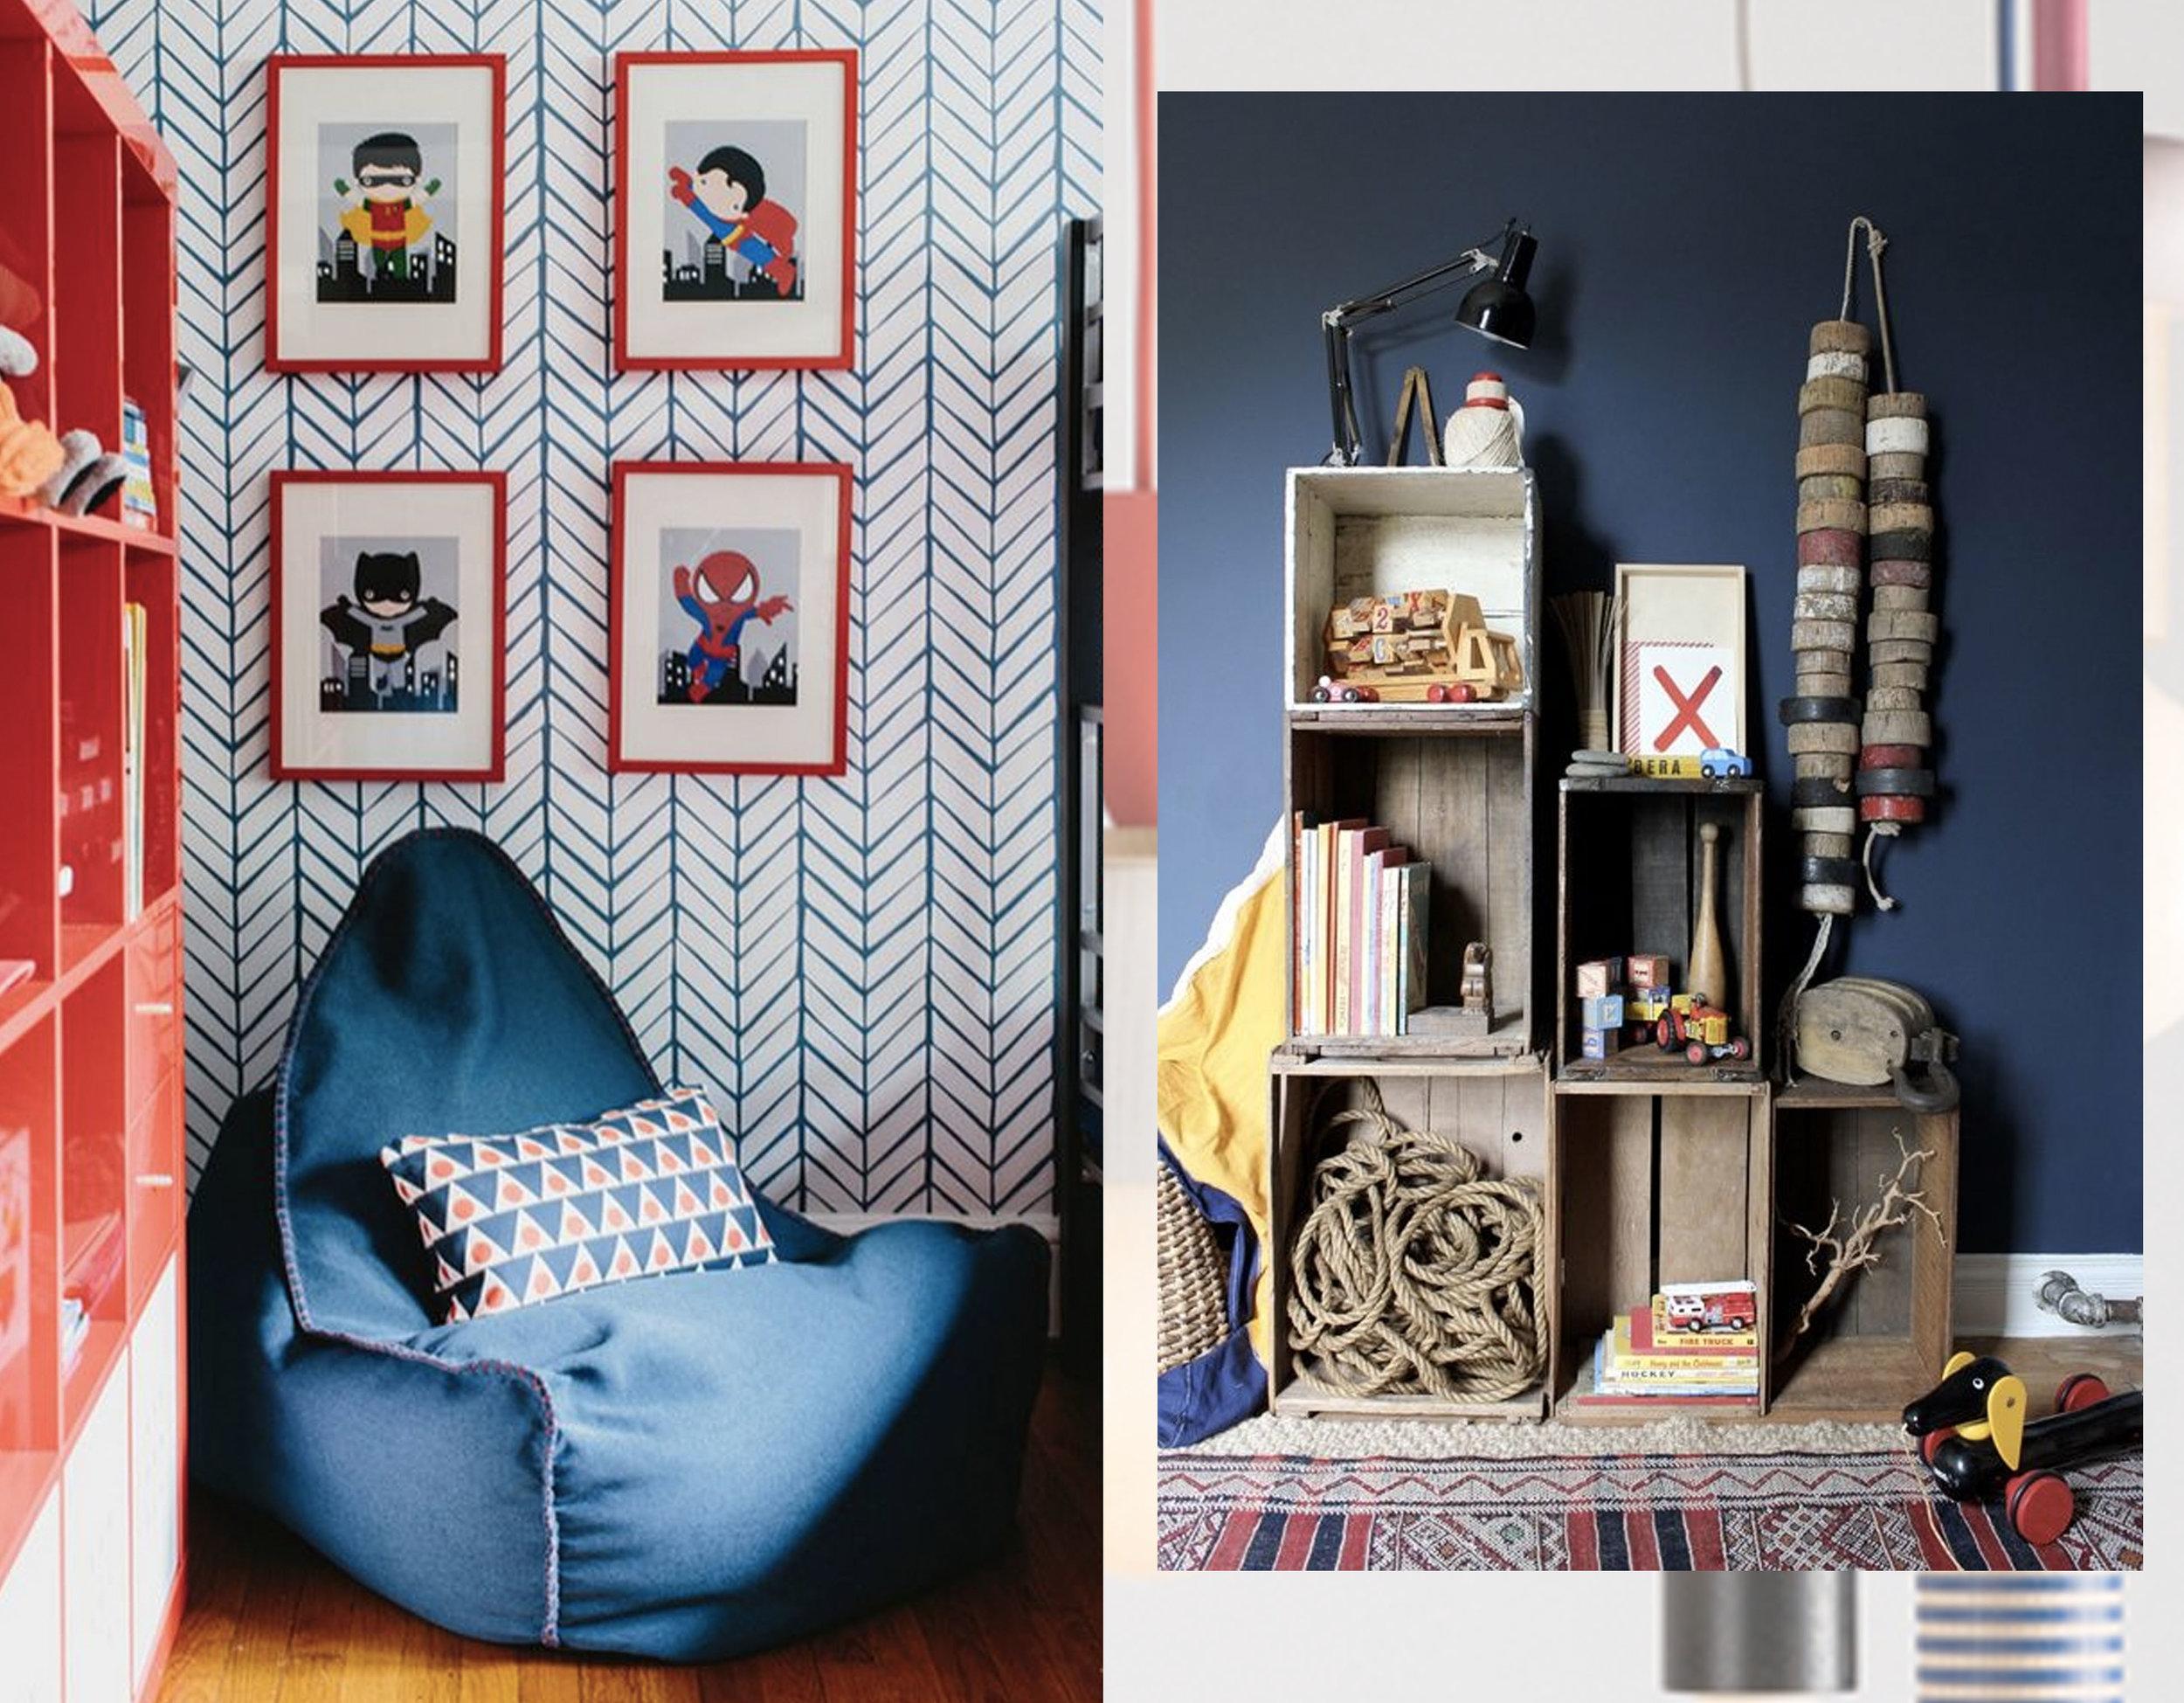 bean bag in kids' room via  Onekindesign  - crate as shelves via  The Marion House